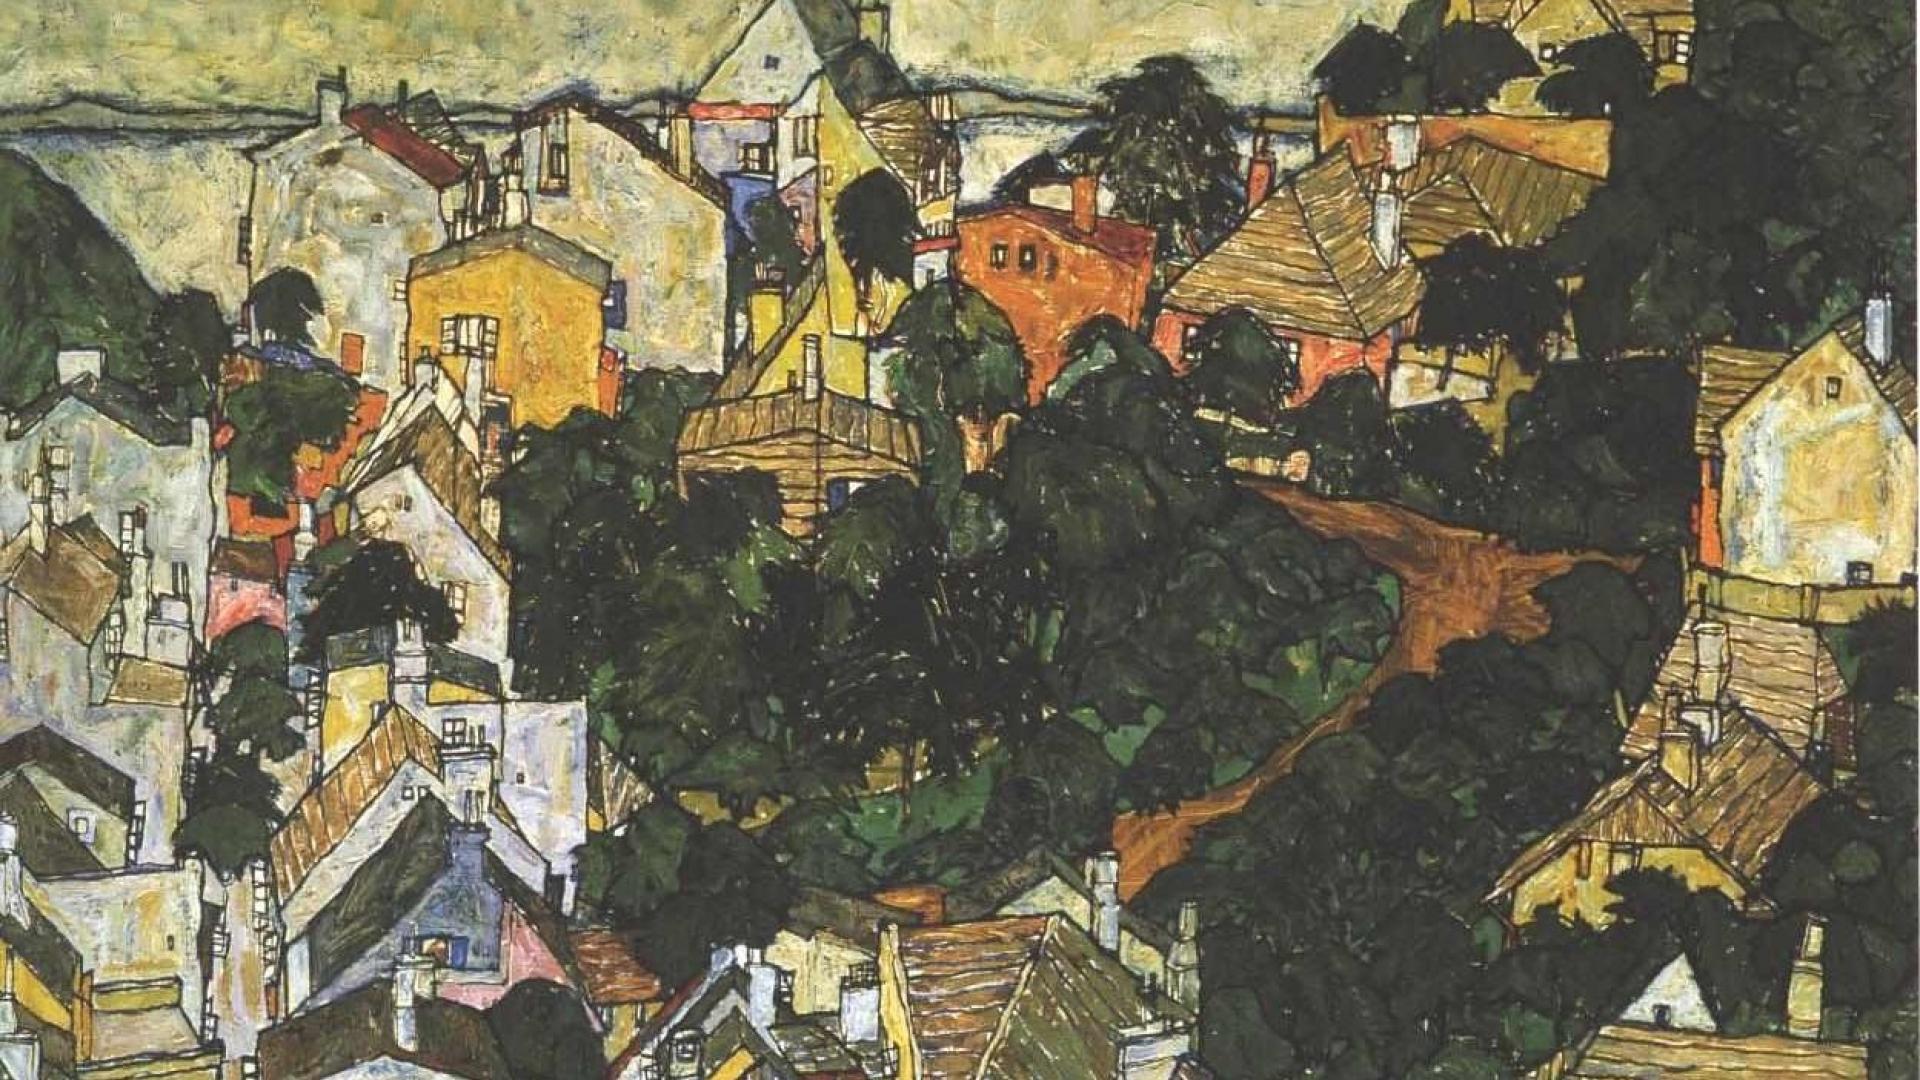 1920x1080 Egon Schiele hình nền